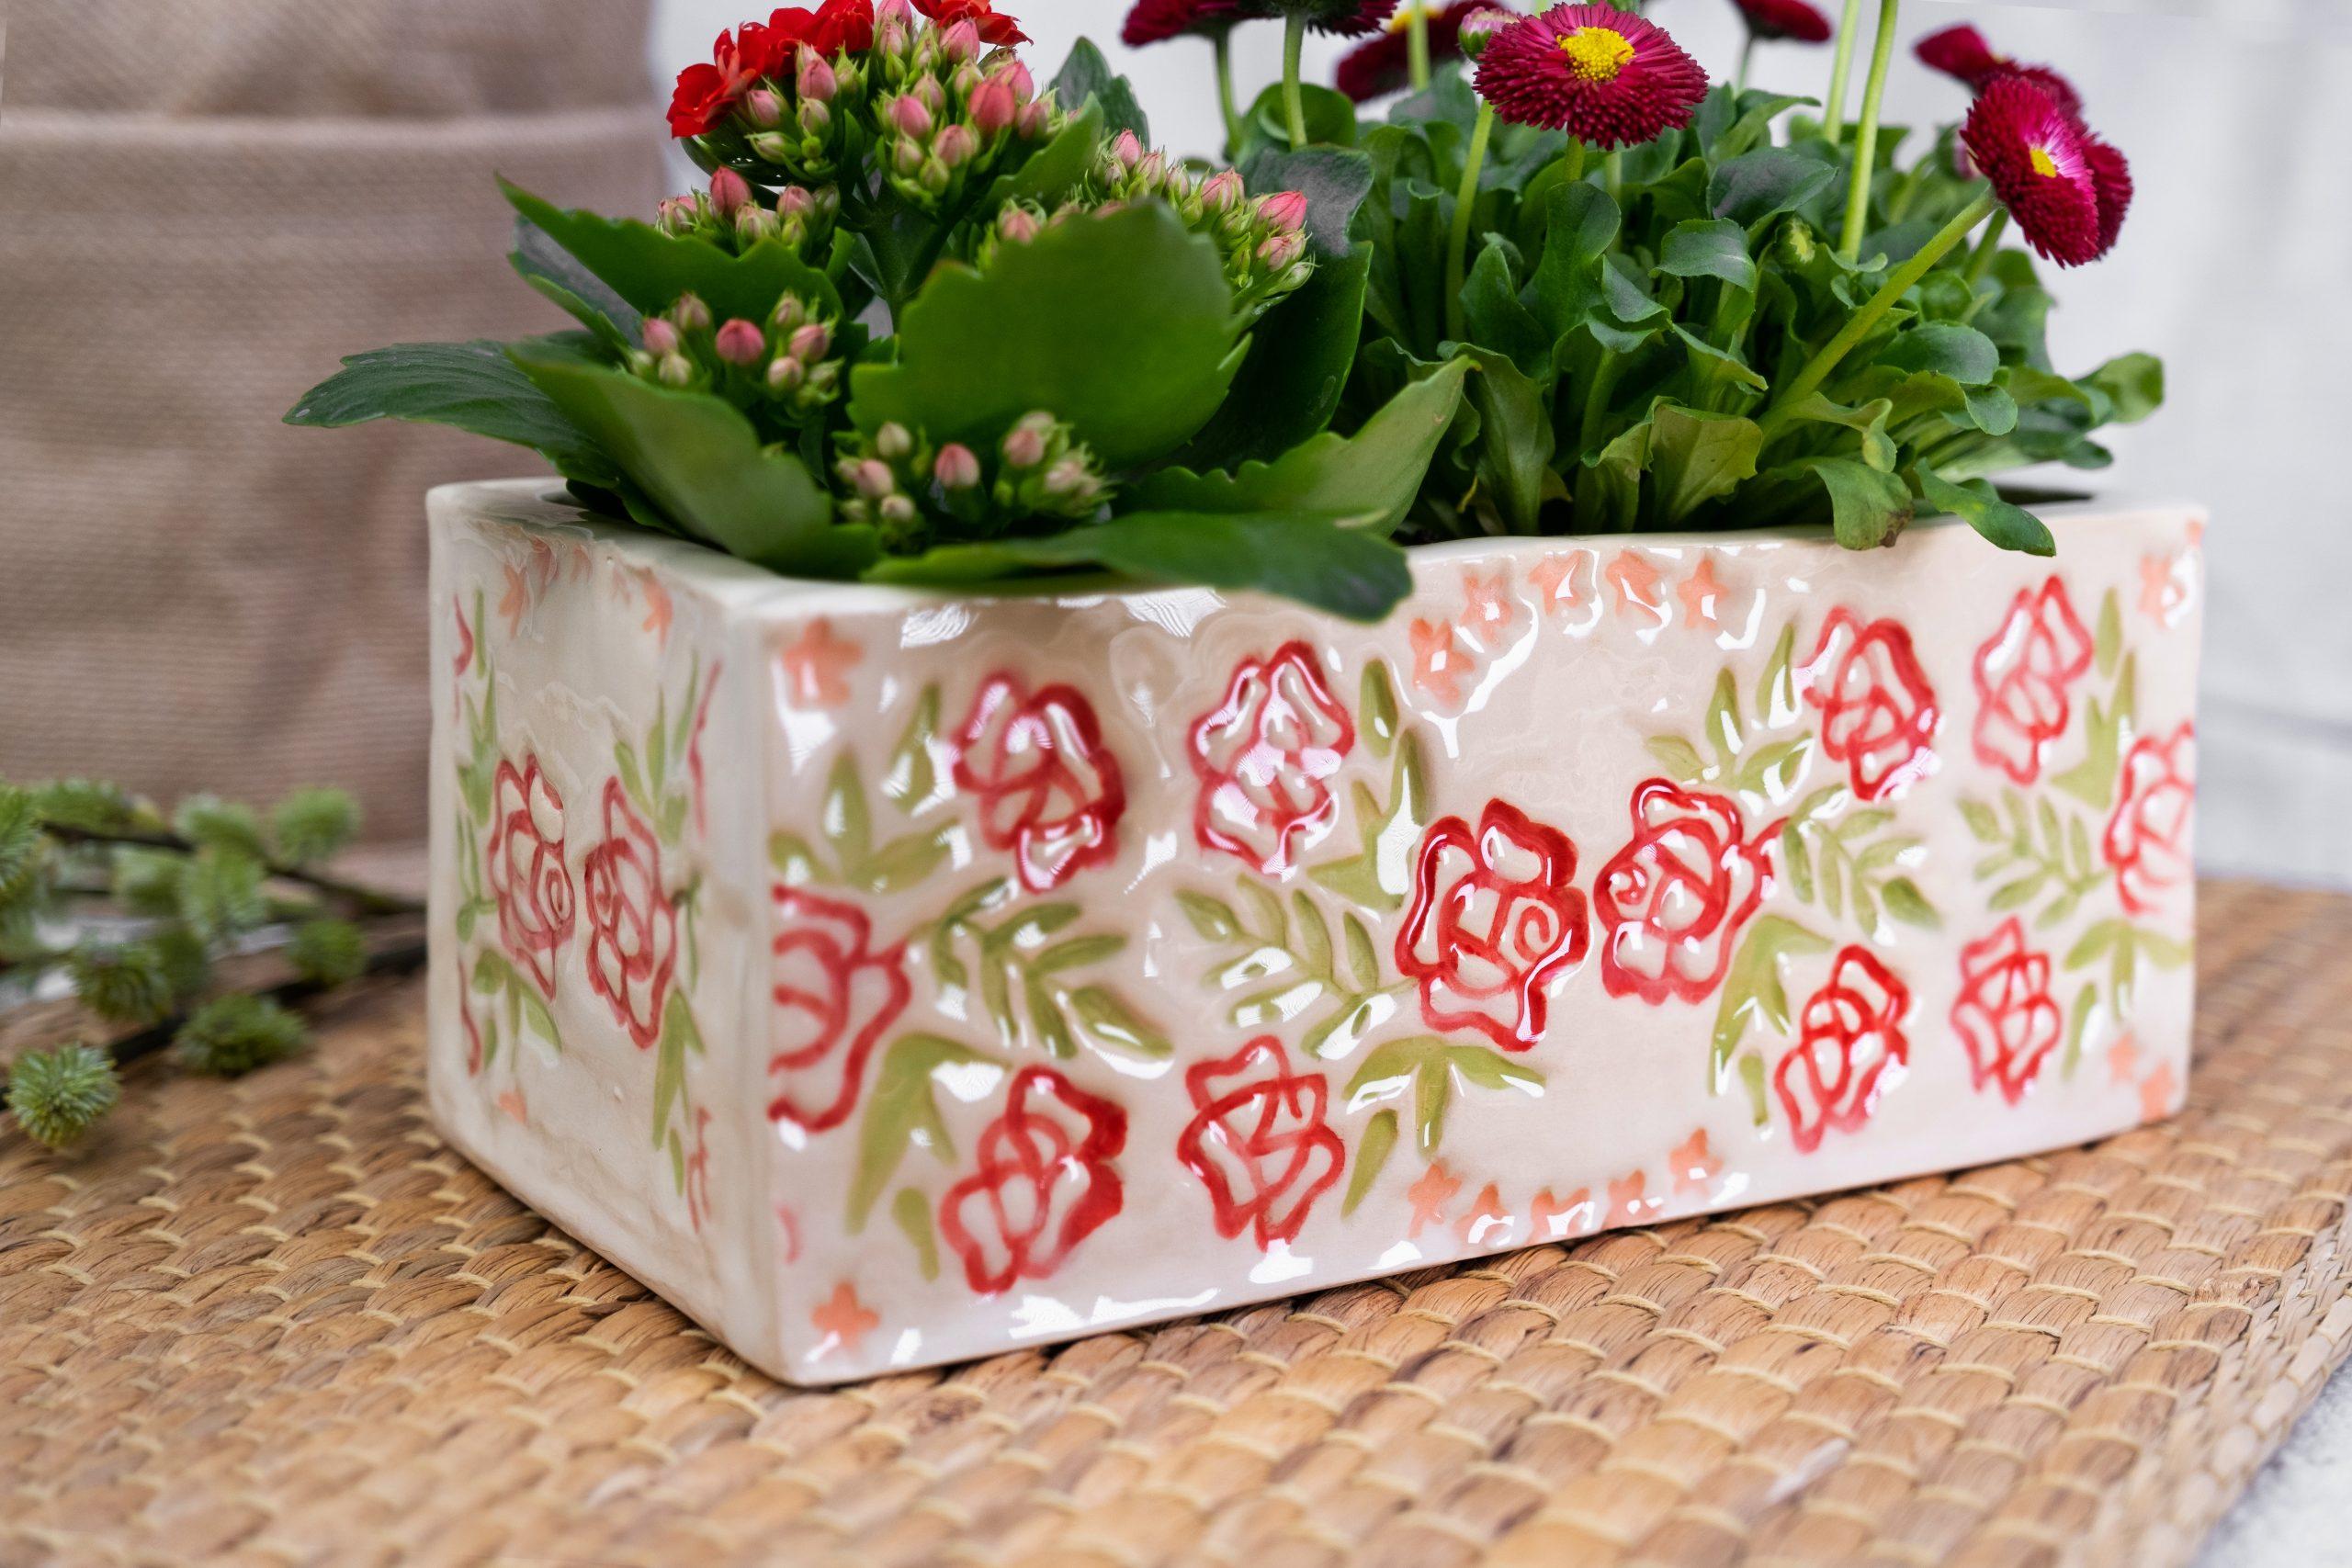 Soulmade ceramics